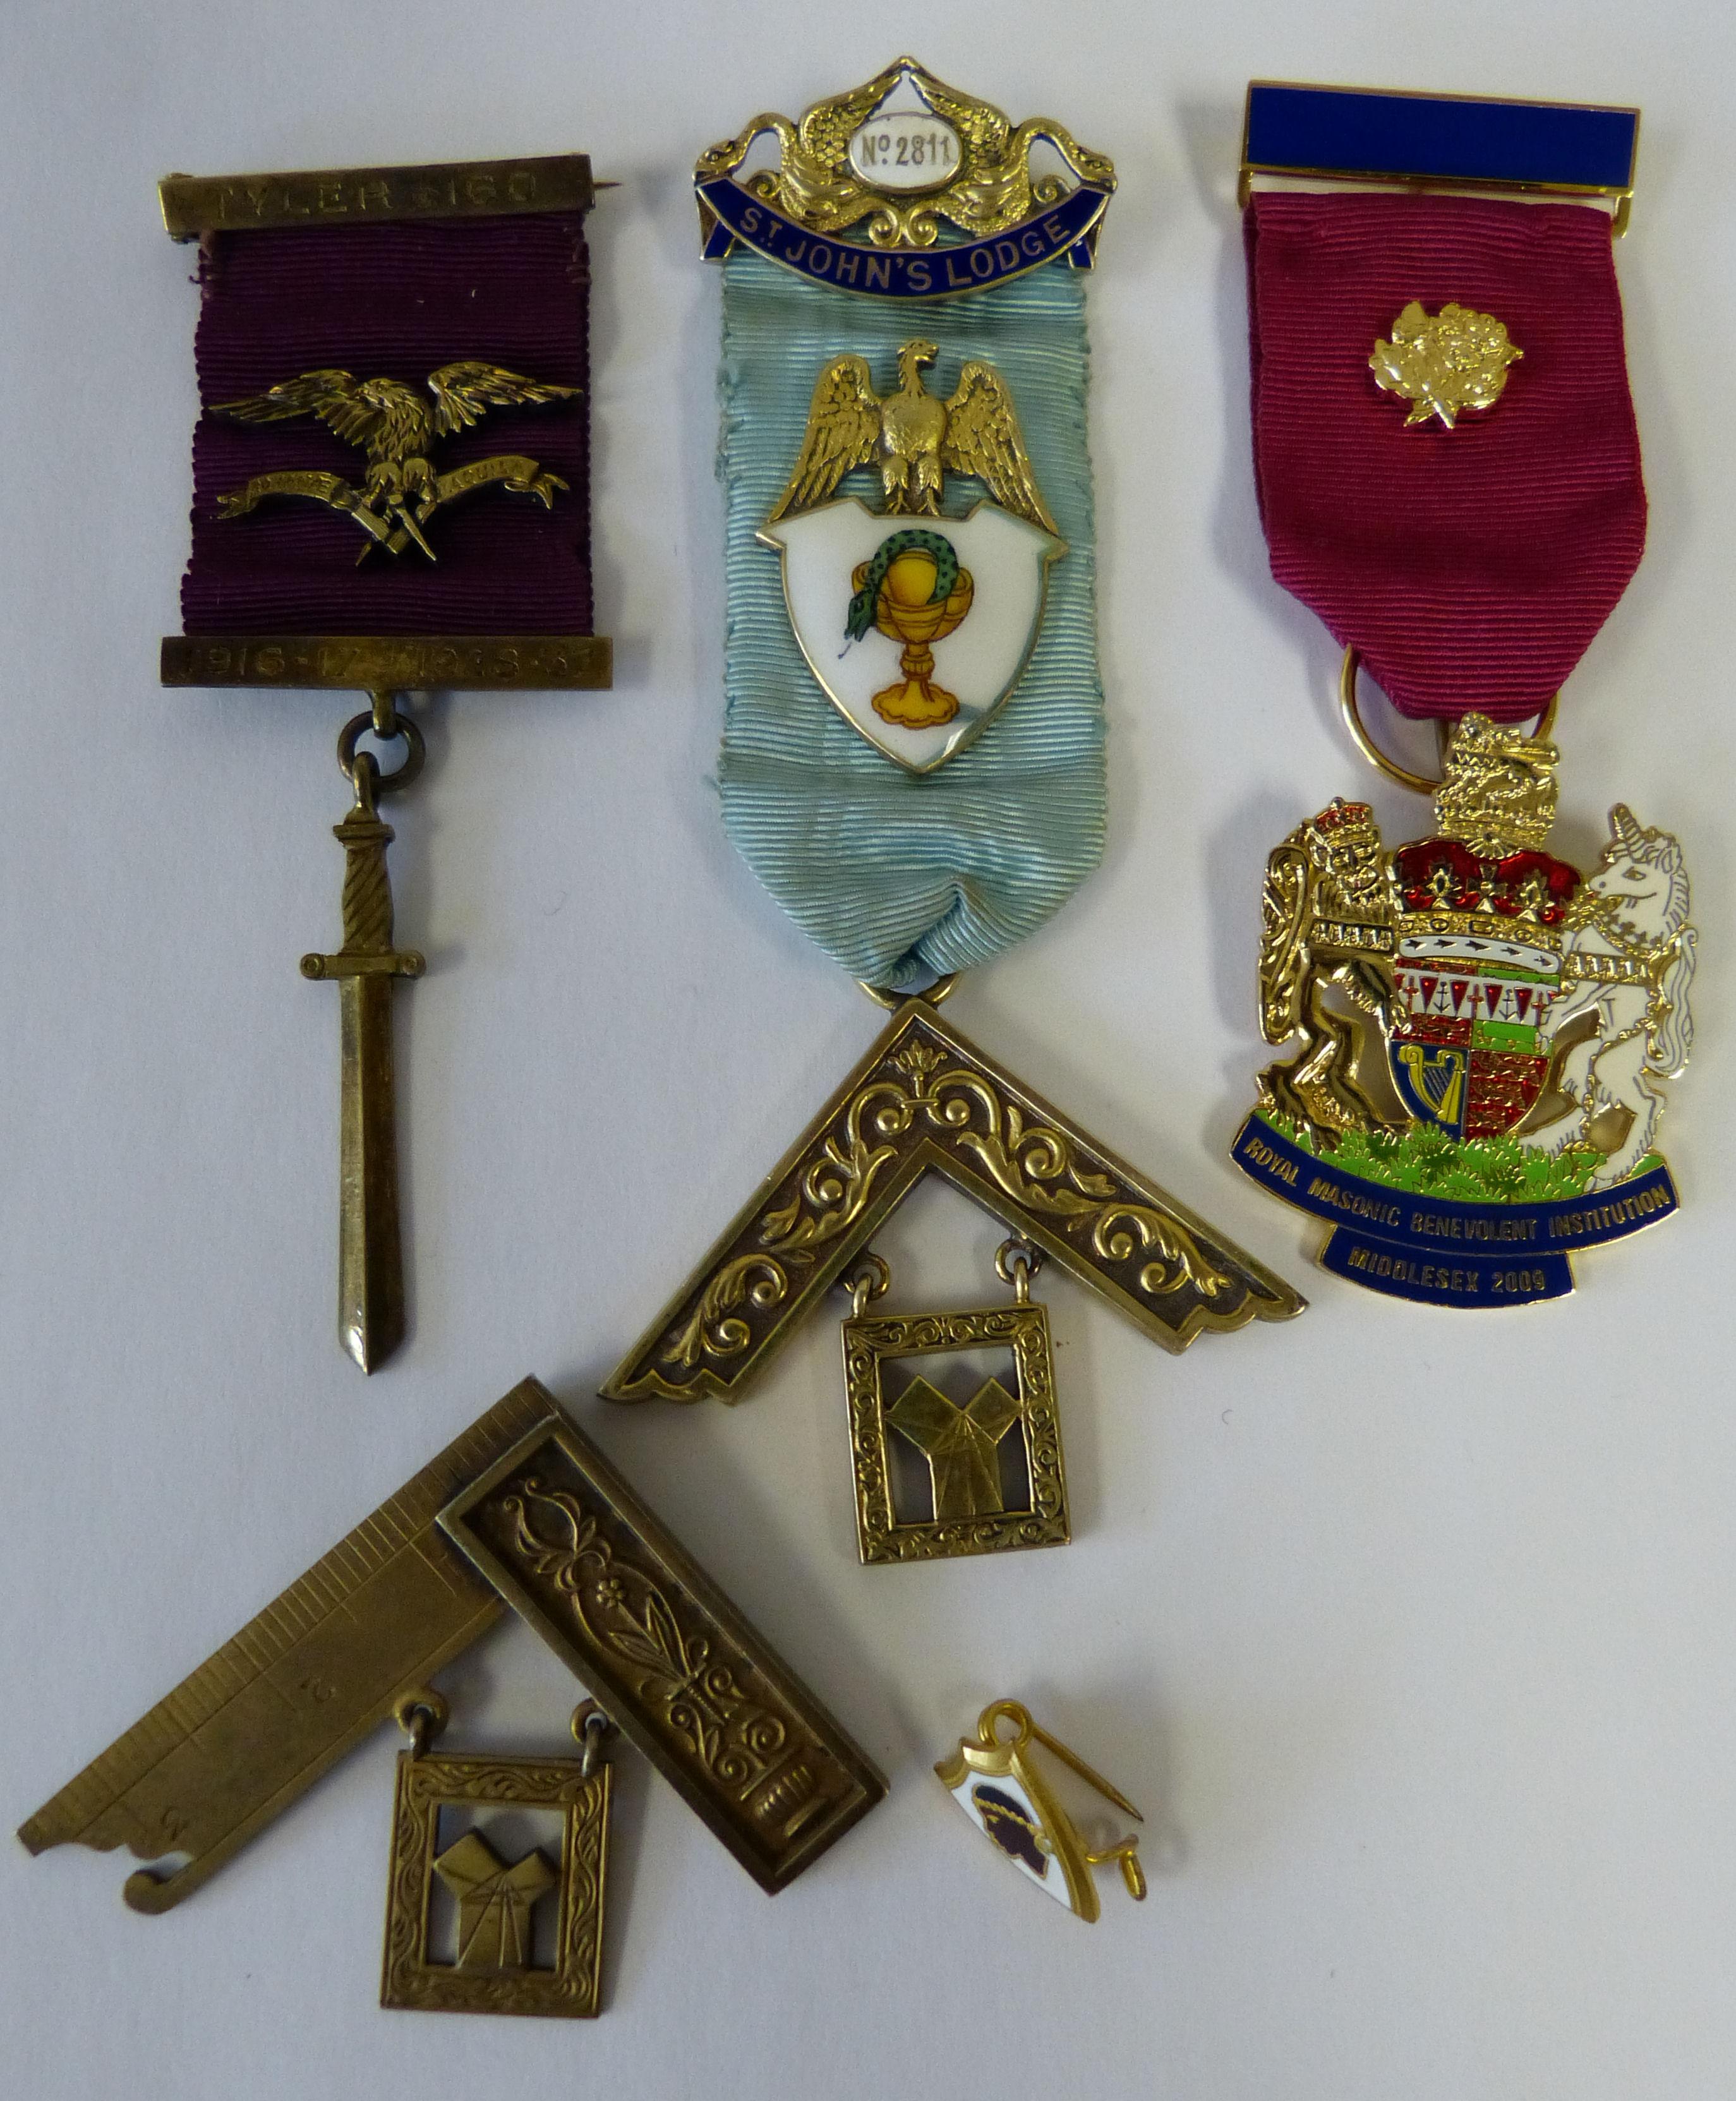 A Silver Gilt Masonic Medal having all over inlaid enamel decoration